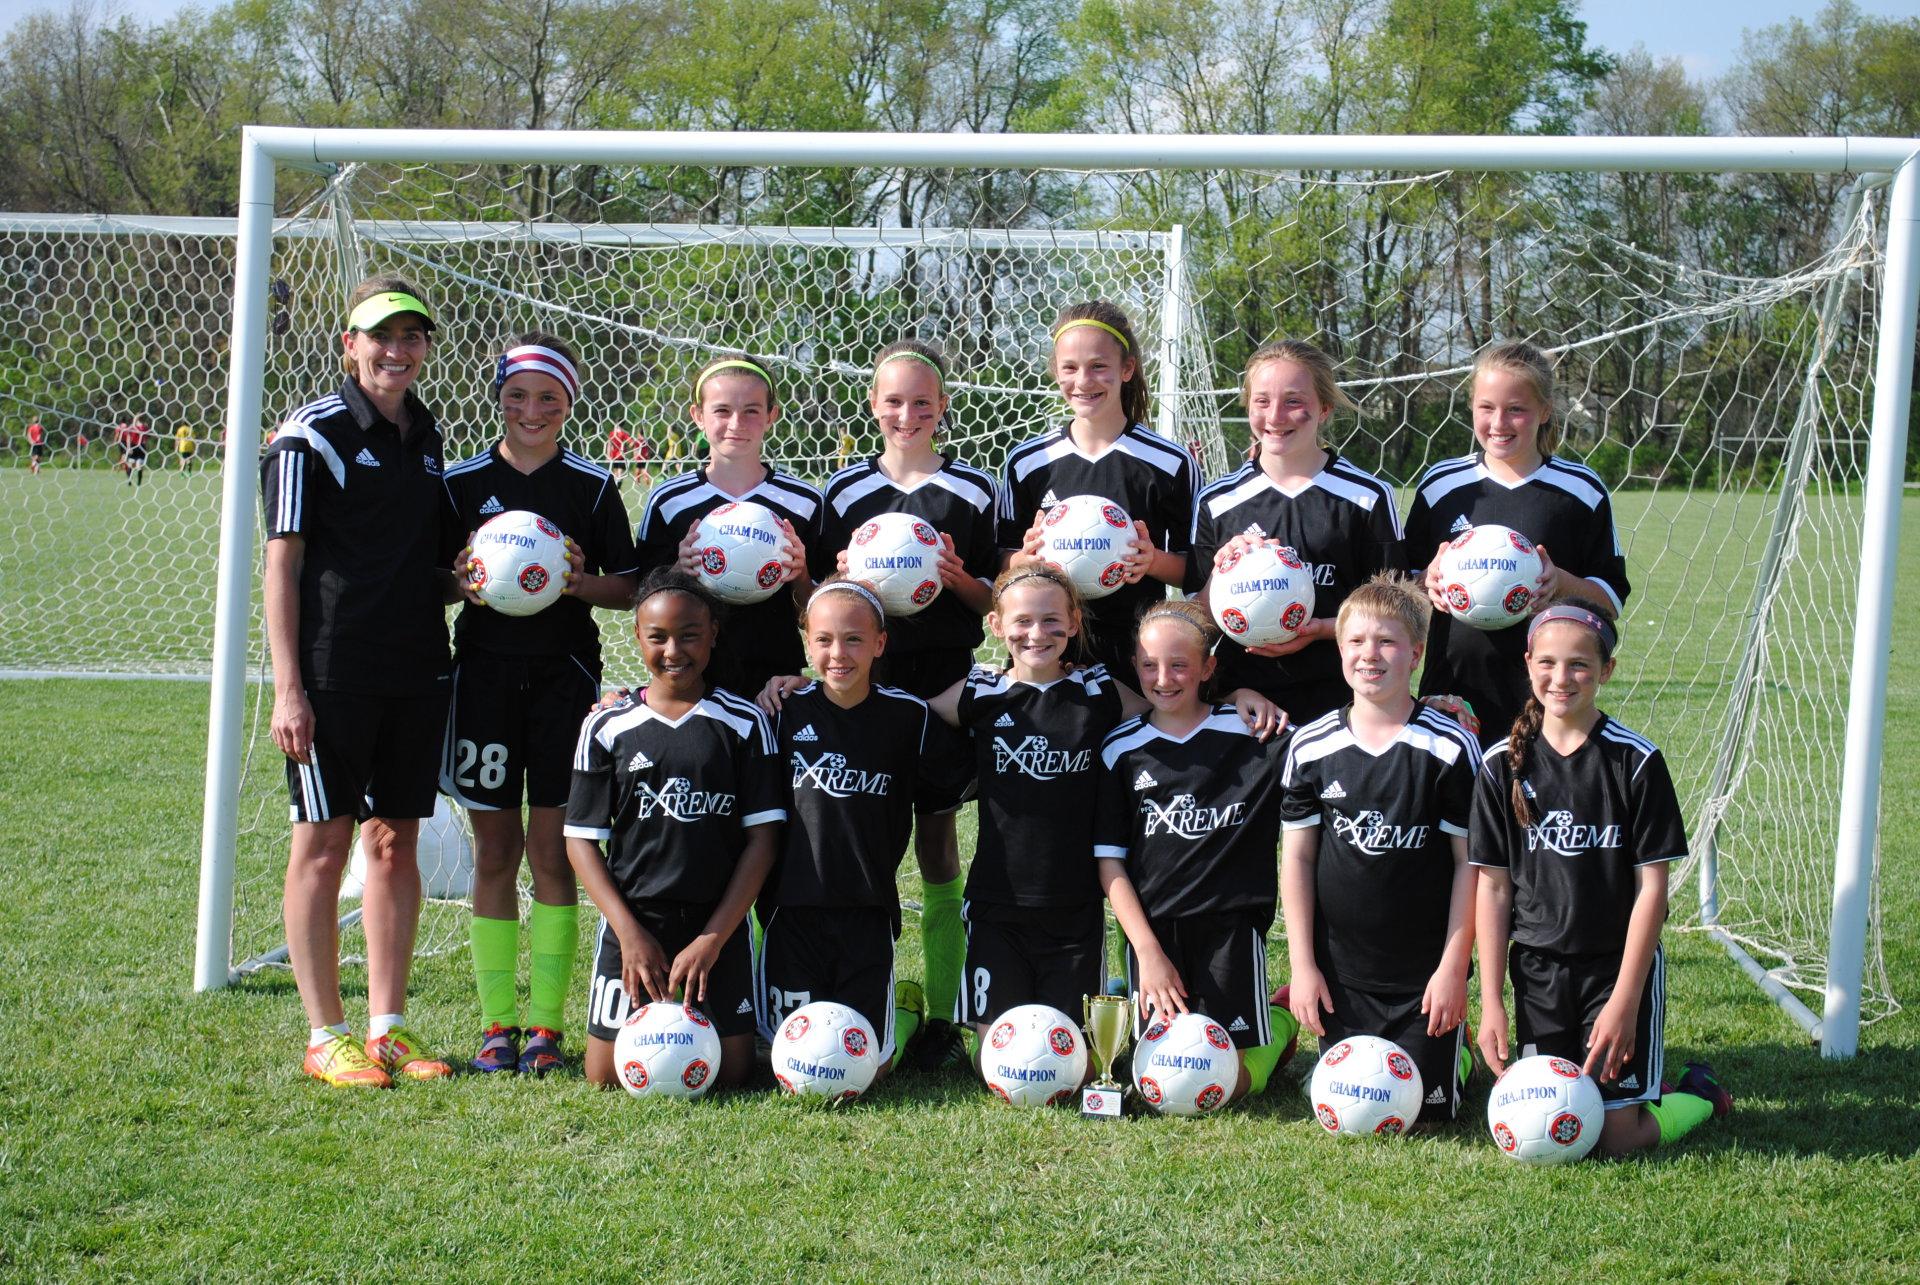 U11 Girls Buckeye Cup Champions!